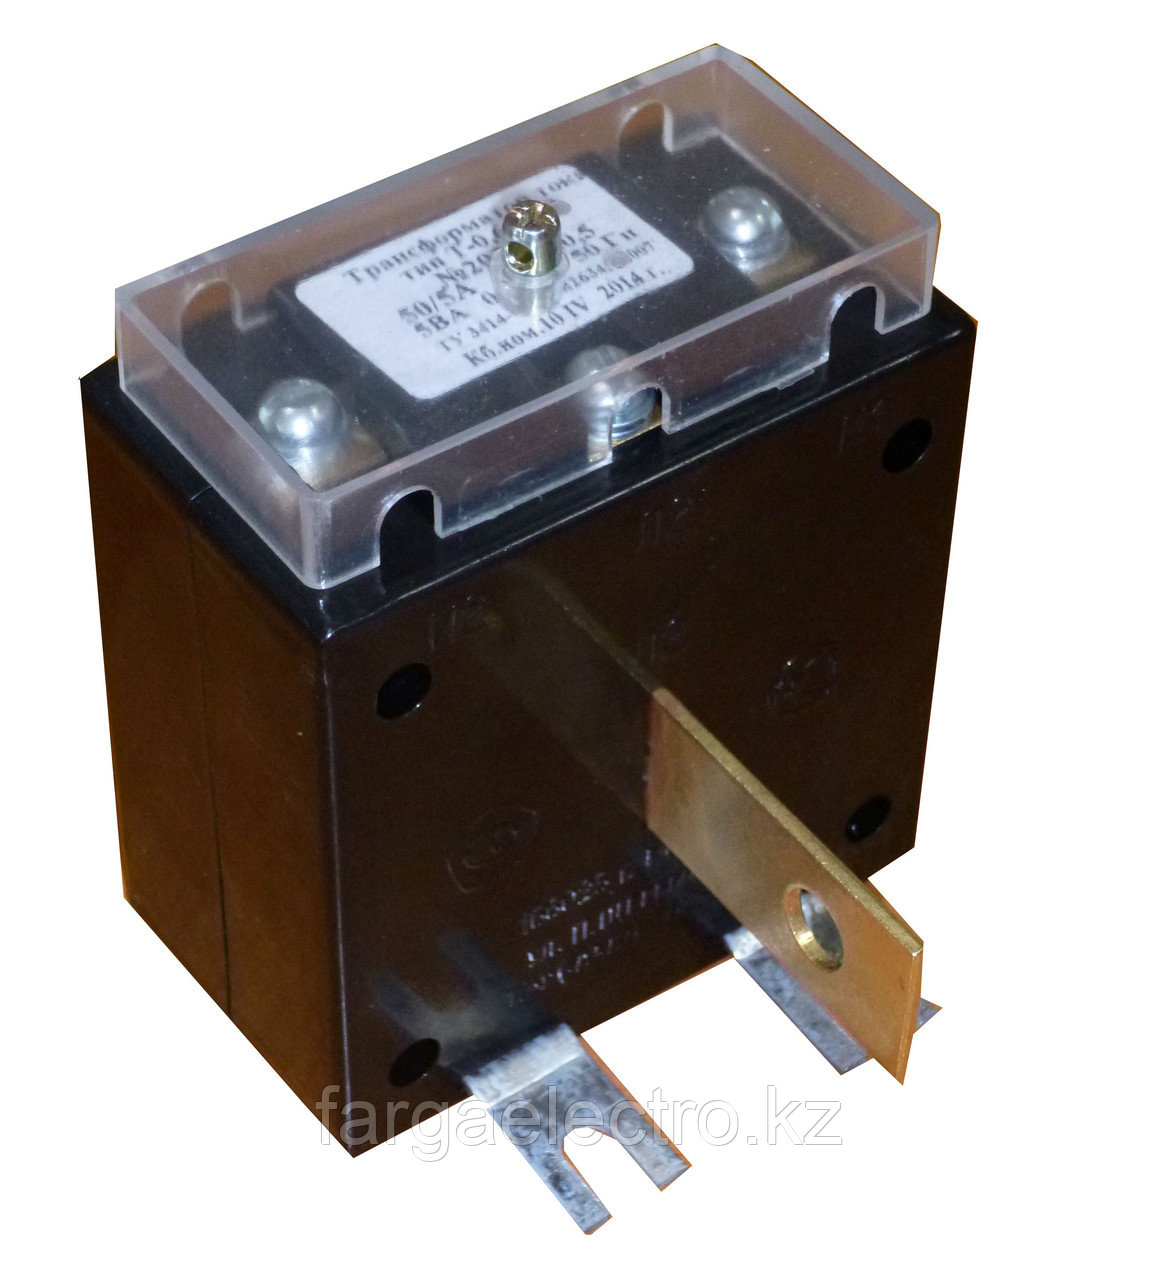 Трансформатор тока Т-0,66 800/5